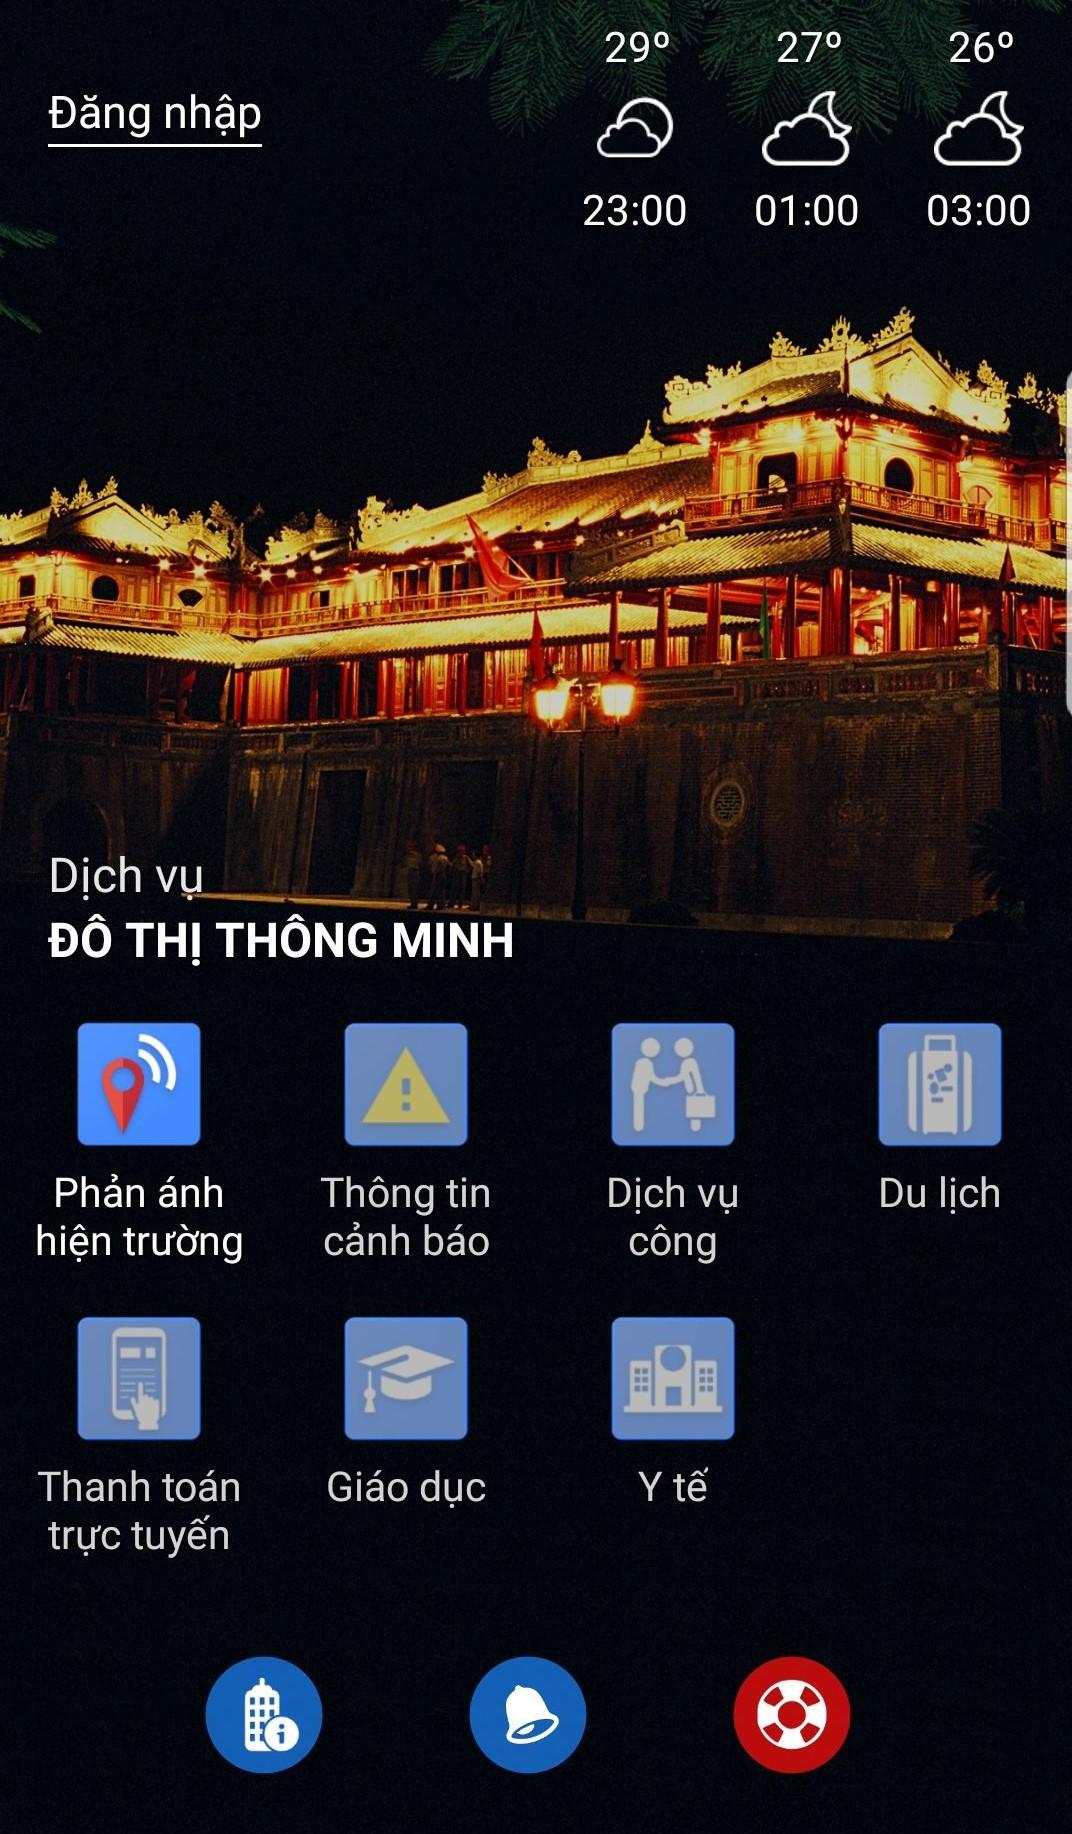 Thừa Thiên Huế triển khai dịch vụ